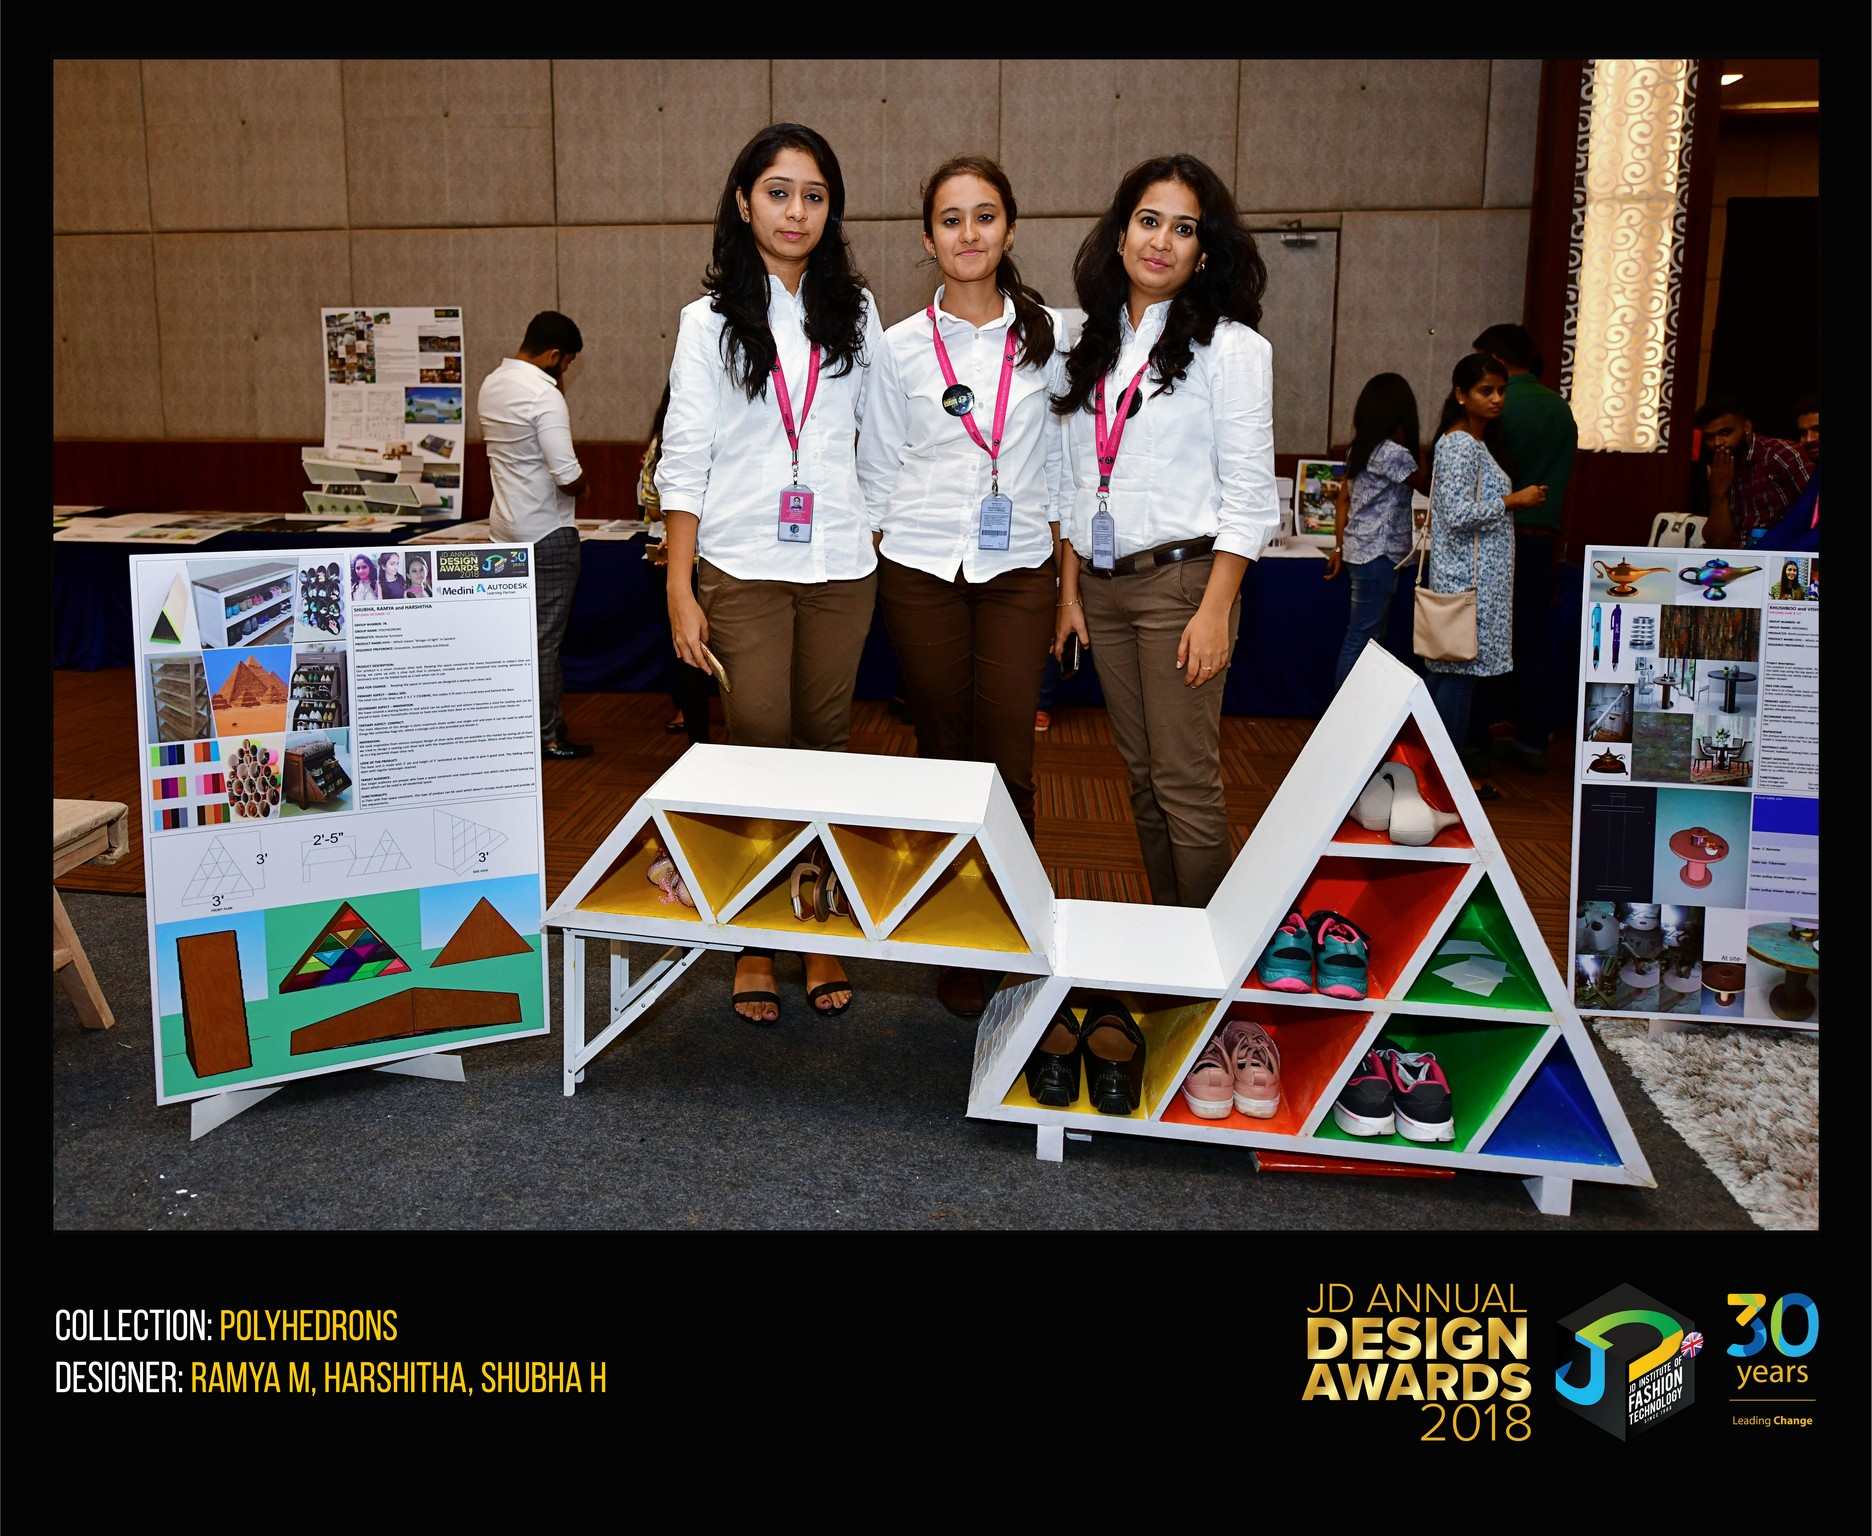 polyhedrons - polyhedrens - POLYHEDRONS – Change – JD Annual Design Awards 2018